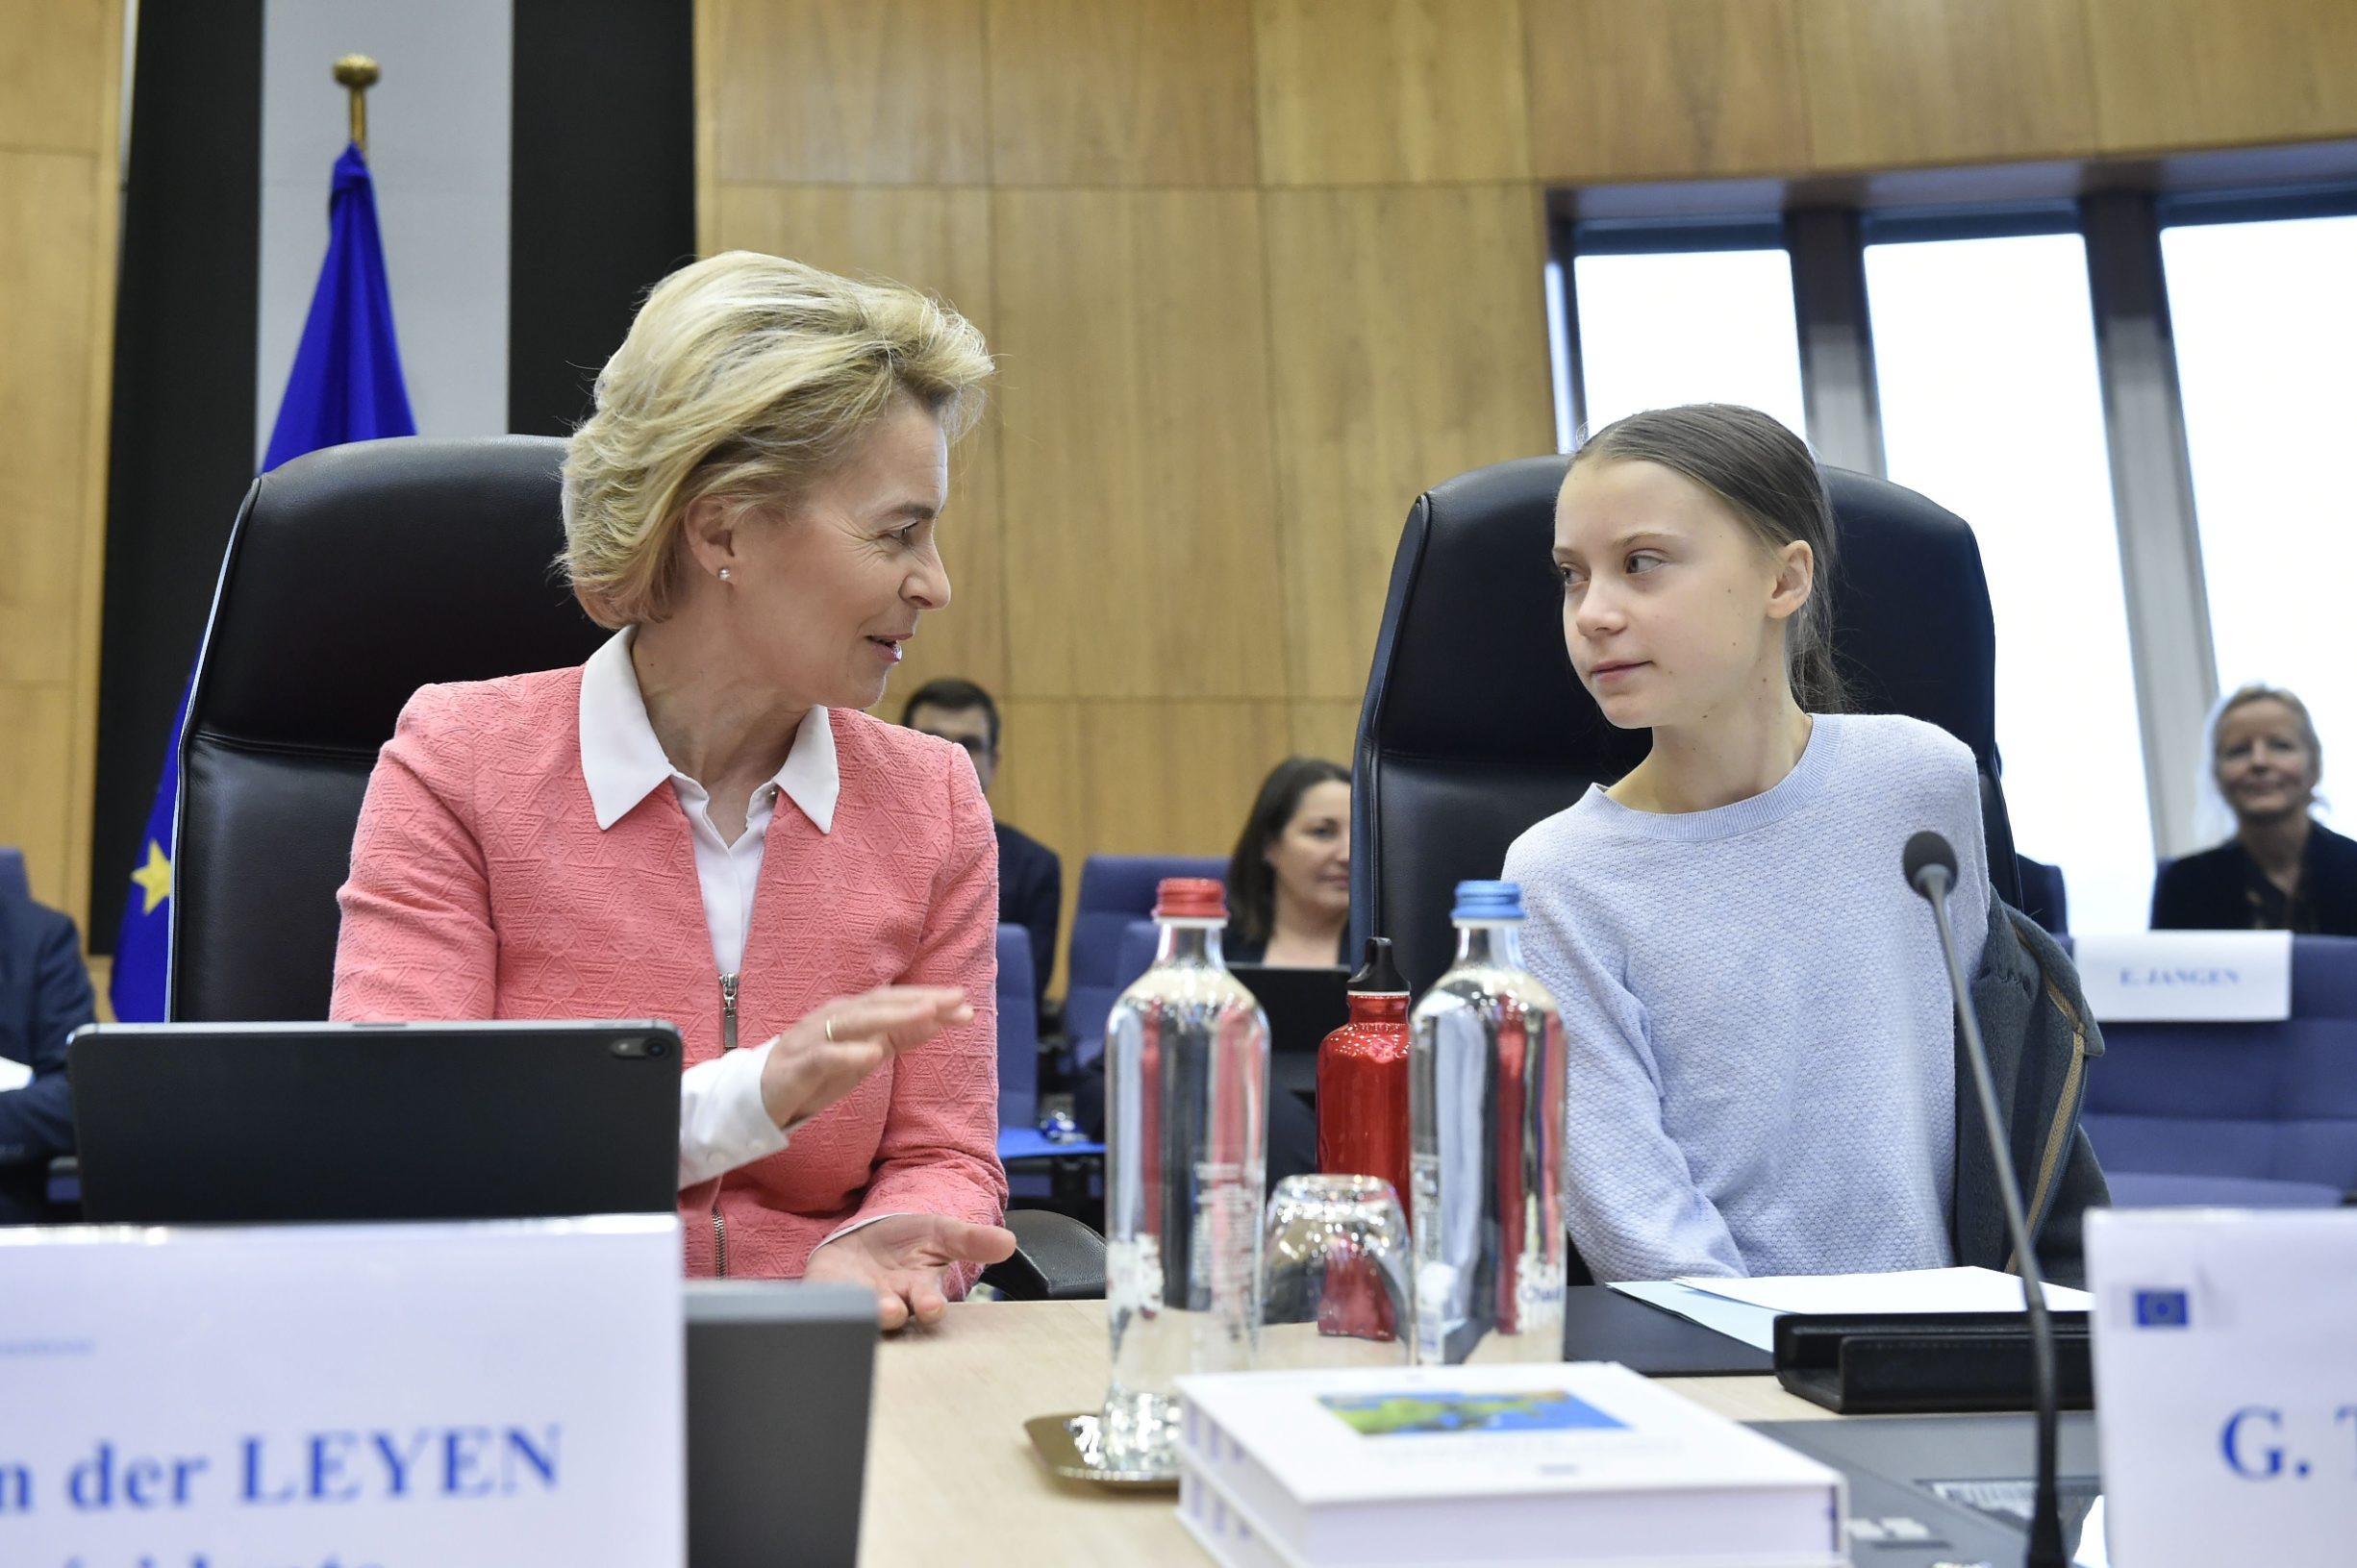 Predsjednica Europske komisije Ursula von der Leyen i klimatska aktivistica Greta Thunberg